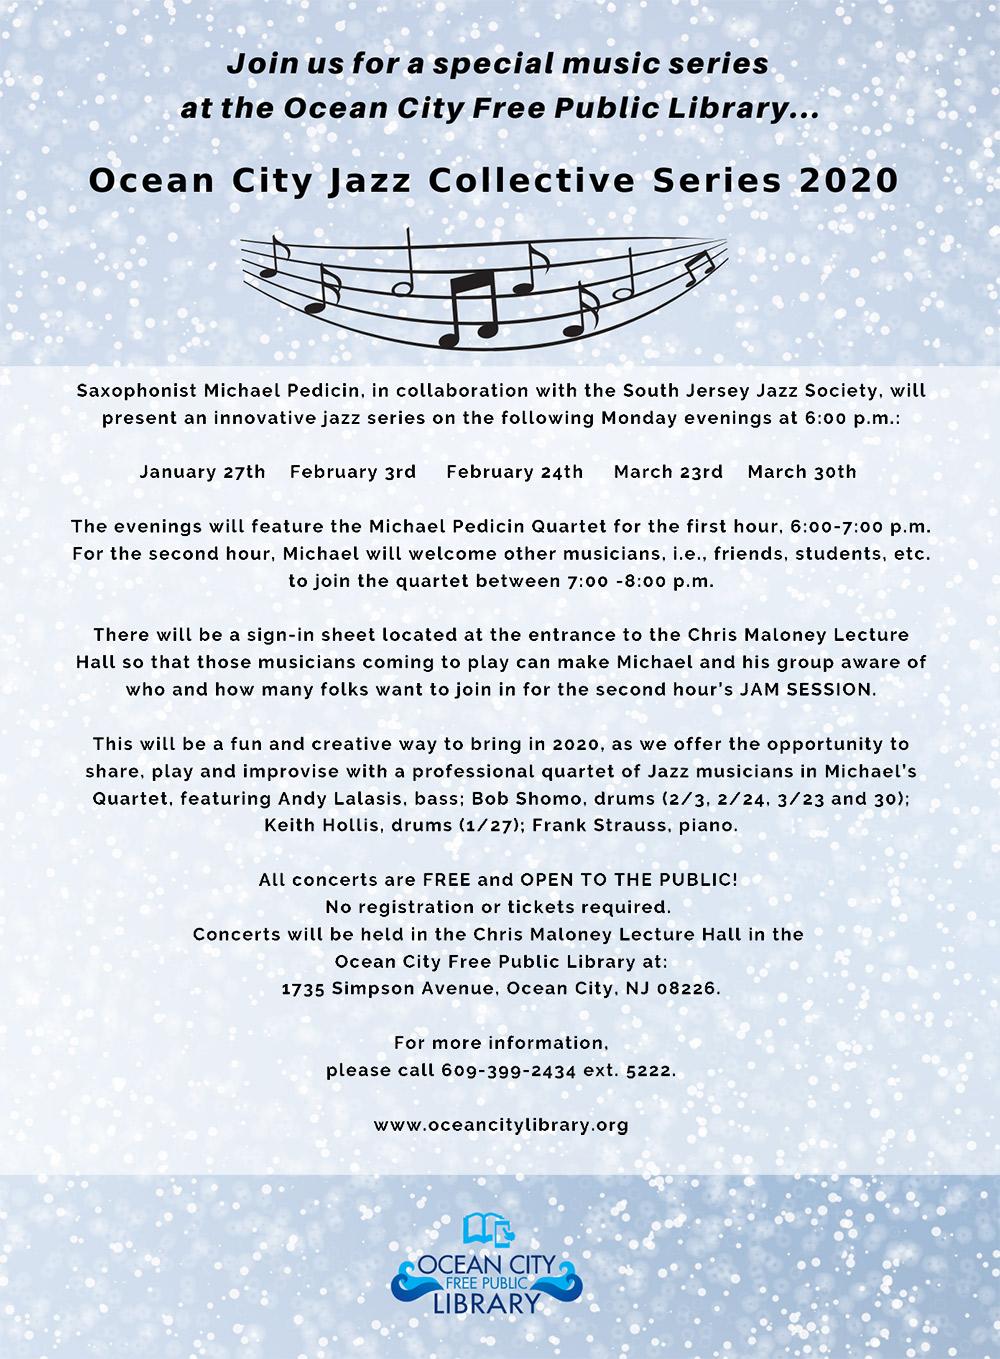 Michael pedicin - Jazz-Collective-Series-2020-Flyer